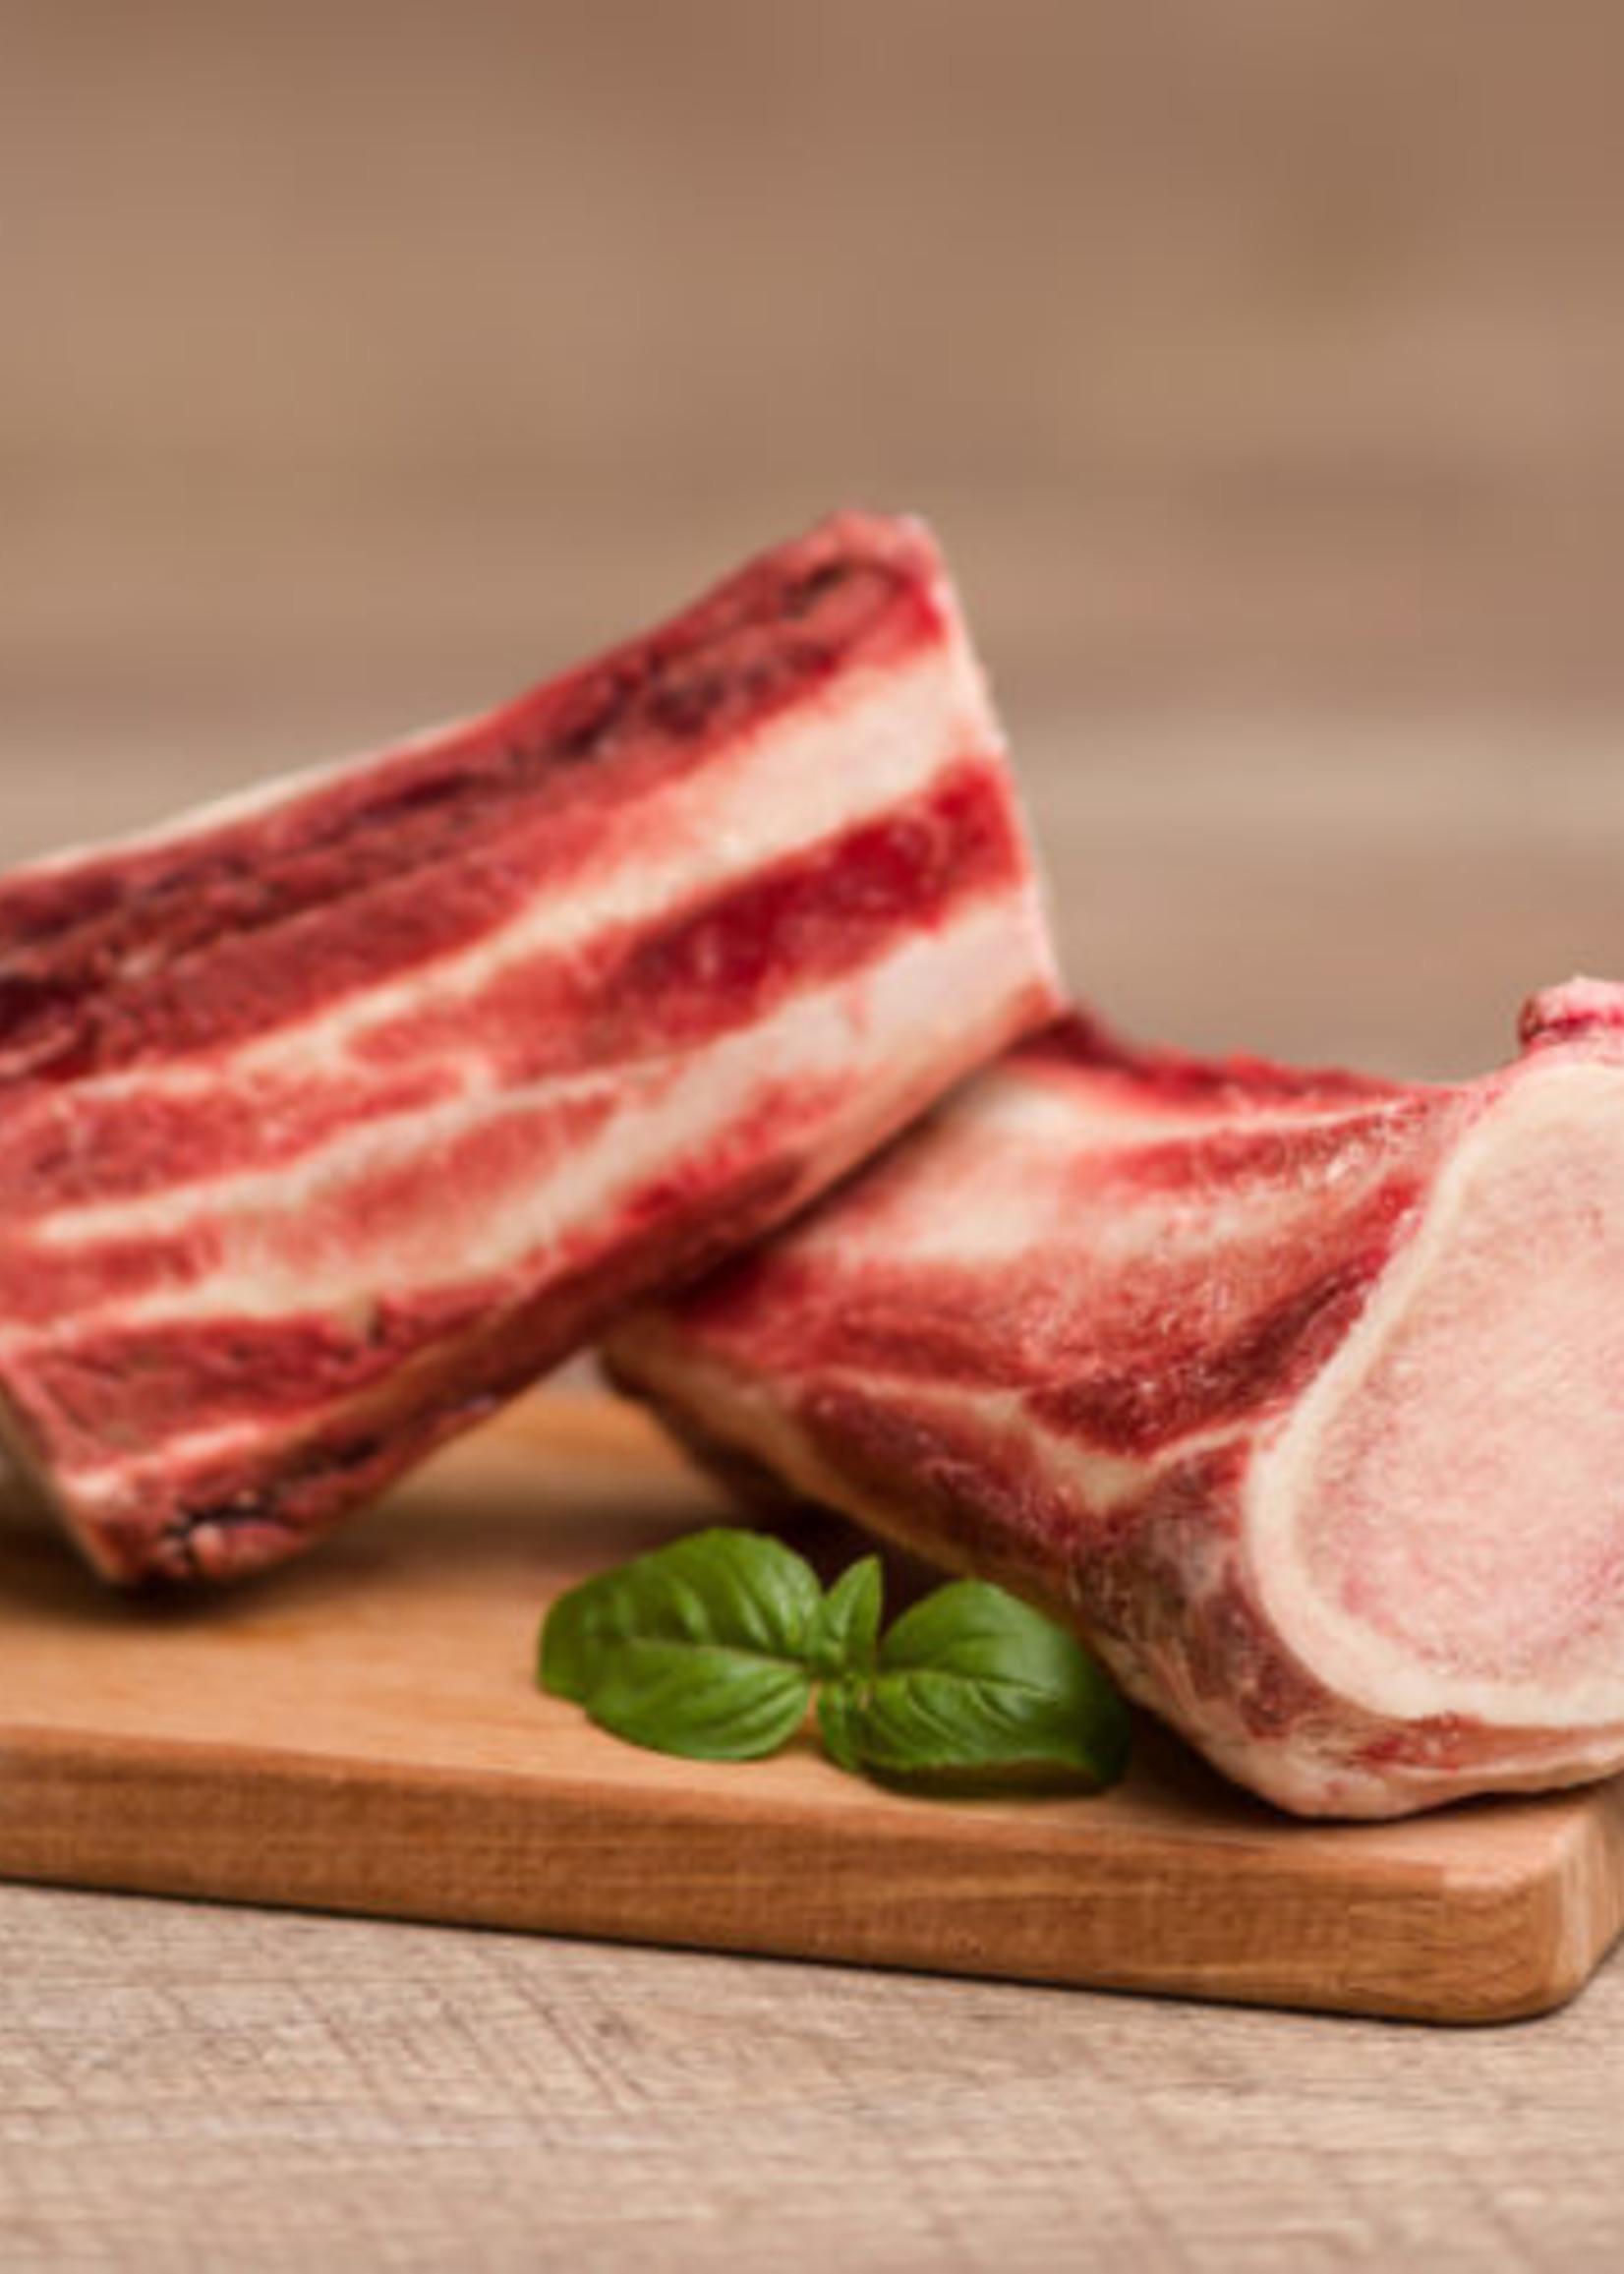 Big Country Raw Big Country Raw Beef Marrow Bone Large 2lbs